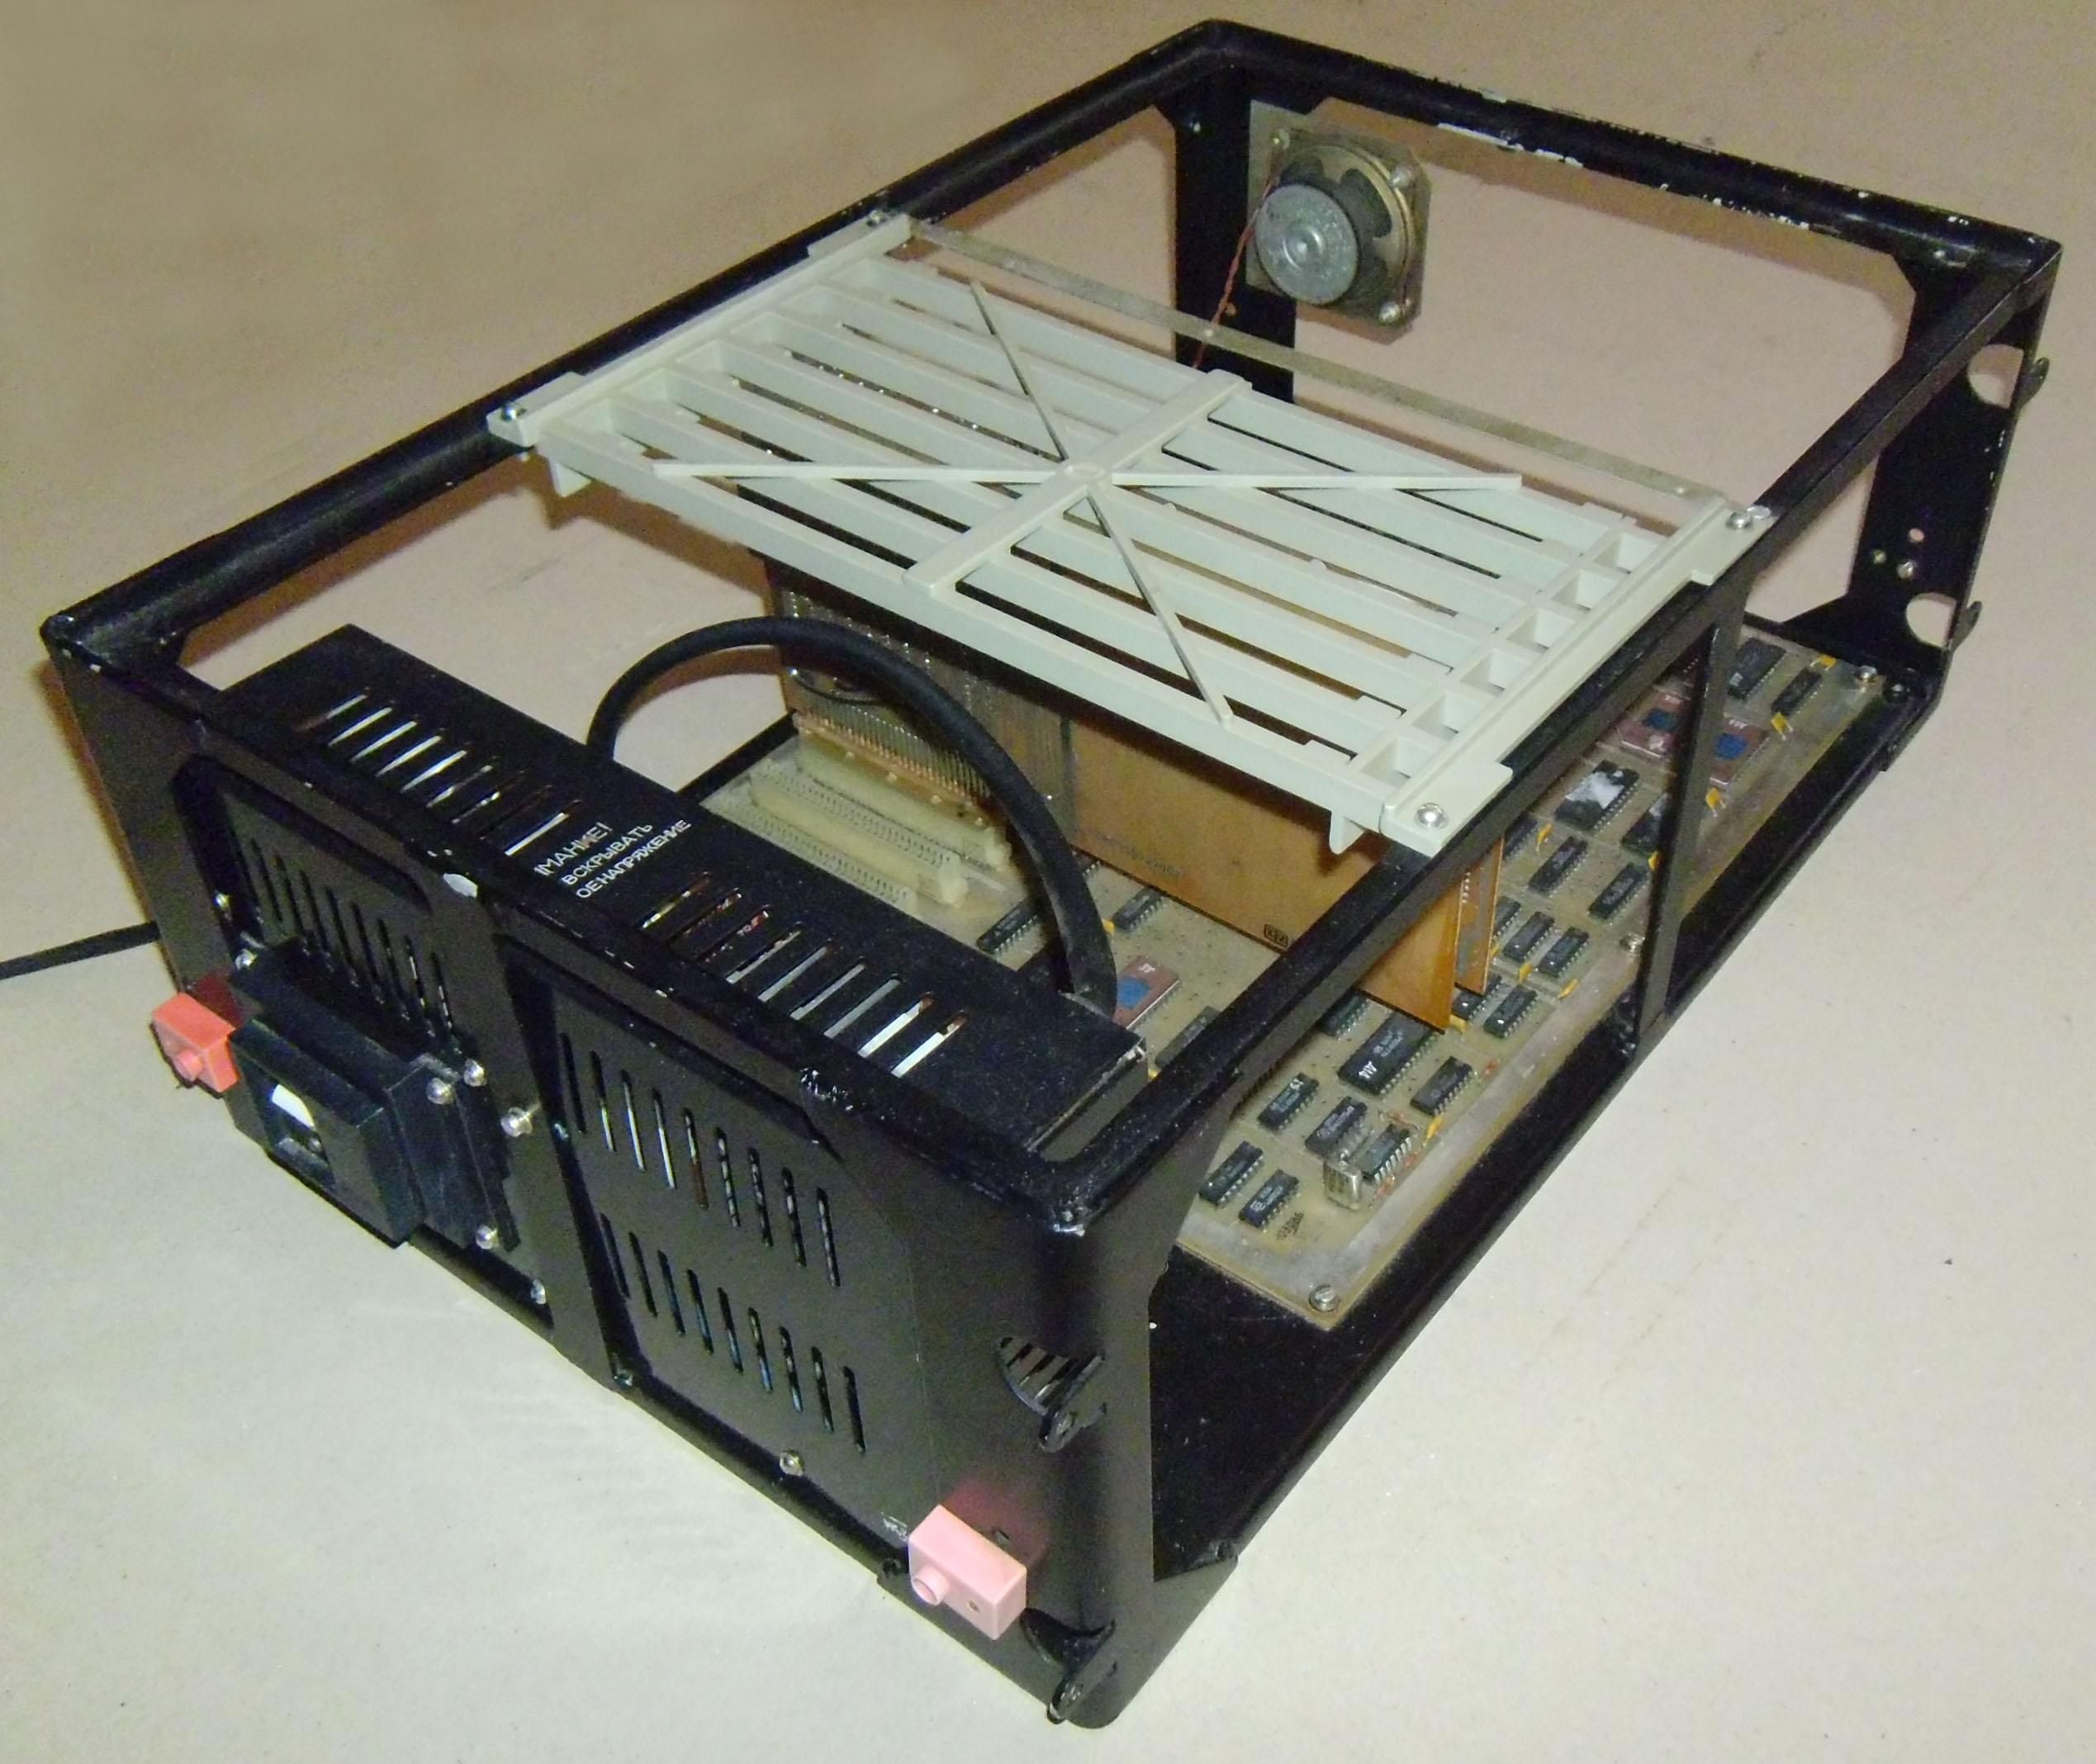 http://agatcomp.ru/agat/Hardware/case/CaseZemz/ZEMZ50.jpg